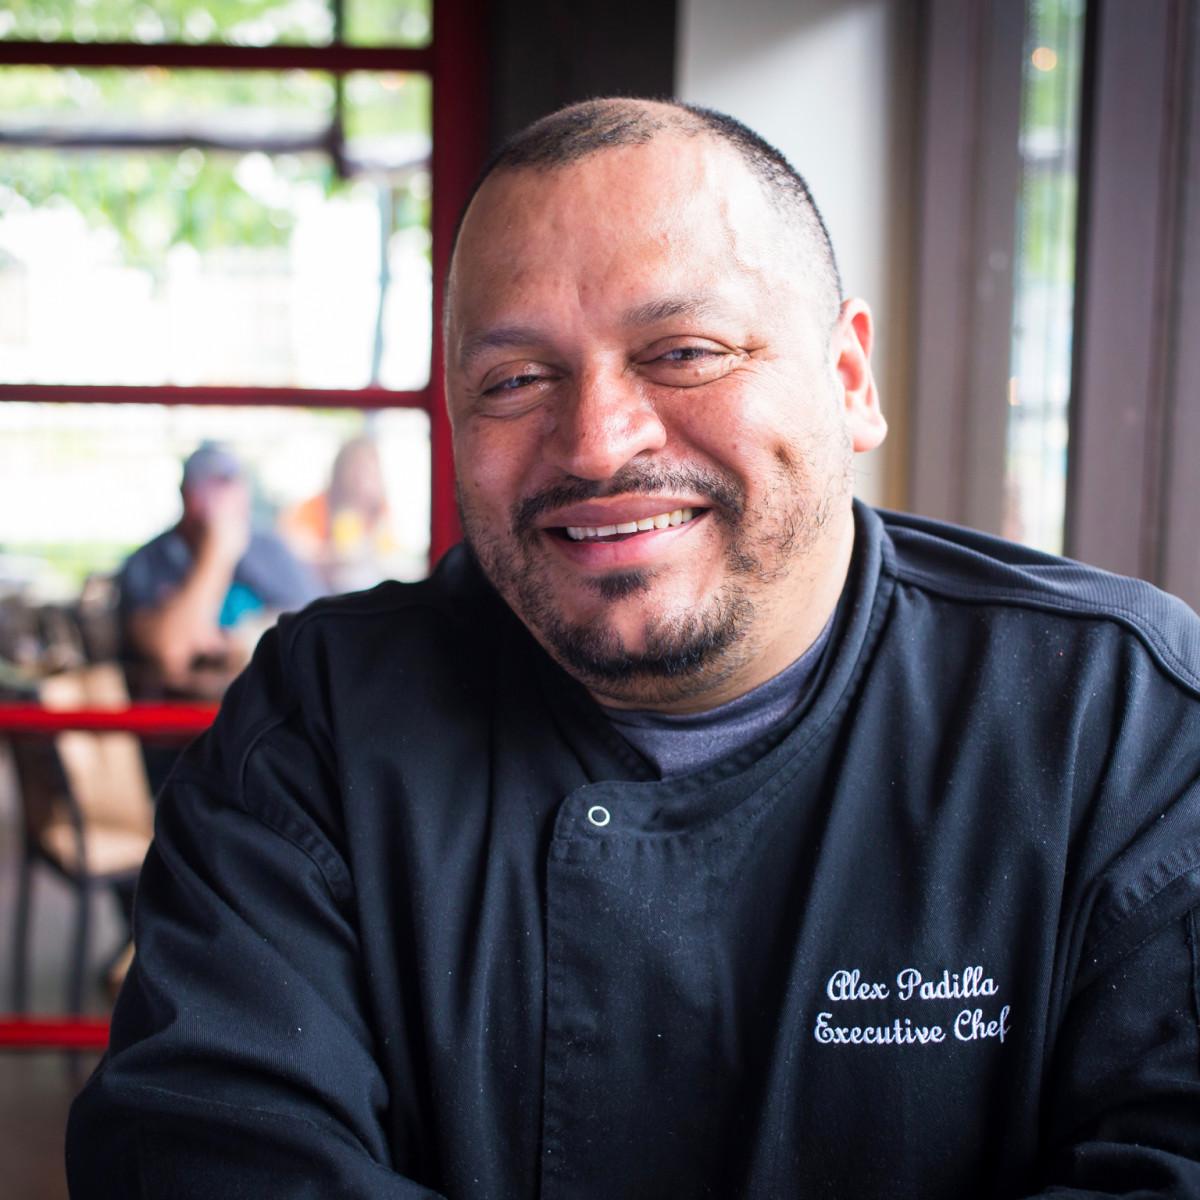 Alex Padilla Legacy Restaurants Ninfa's Antone's